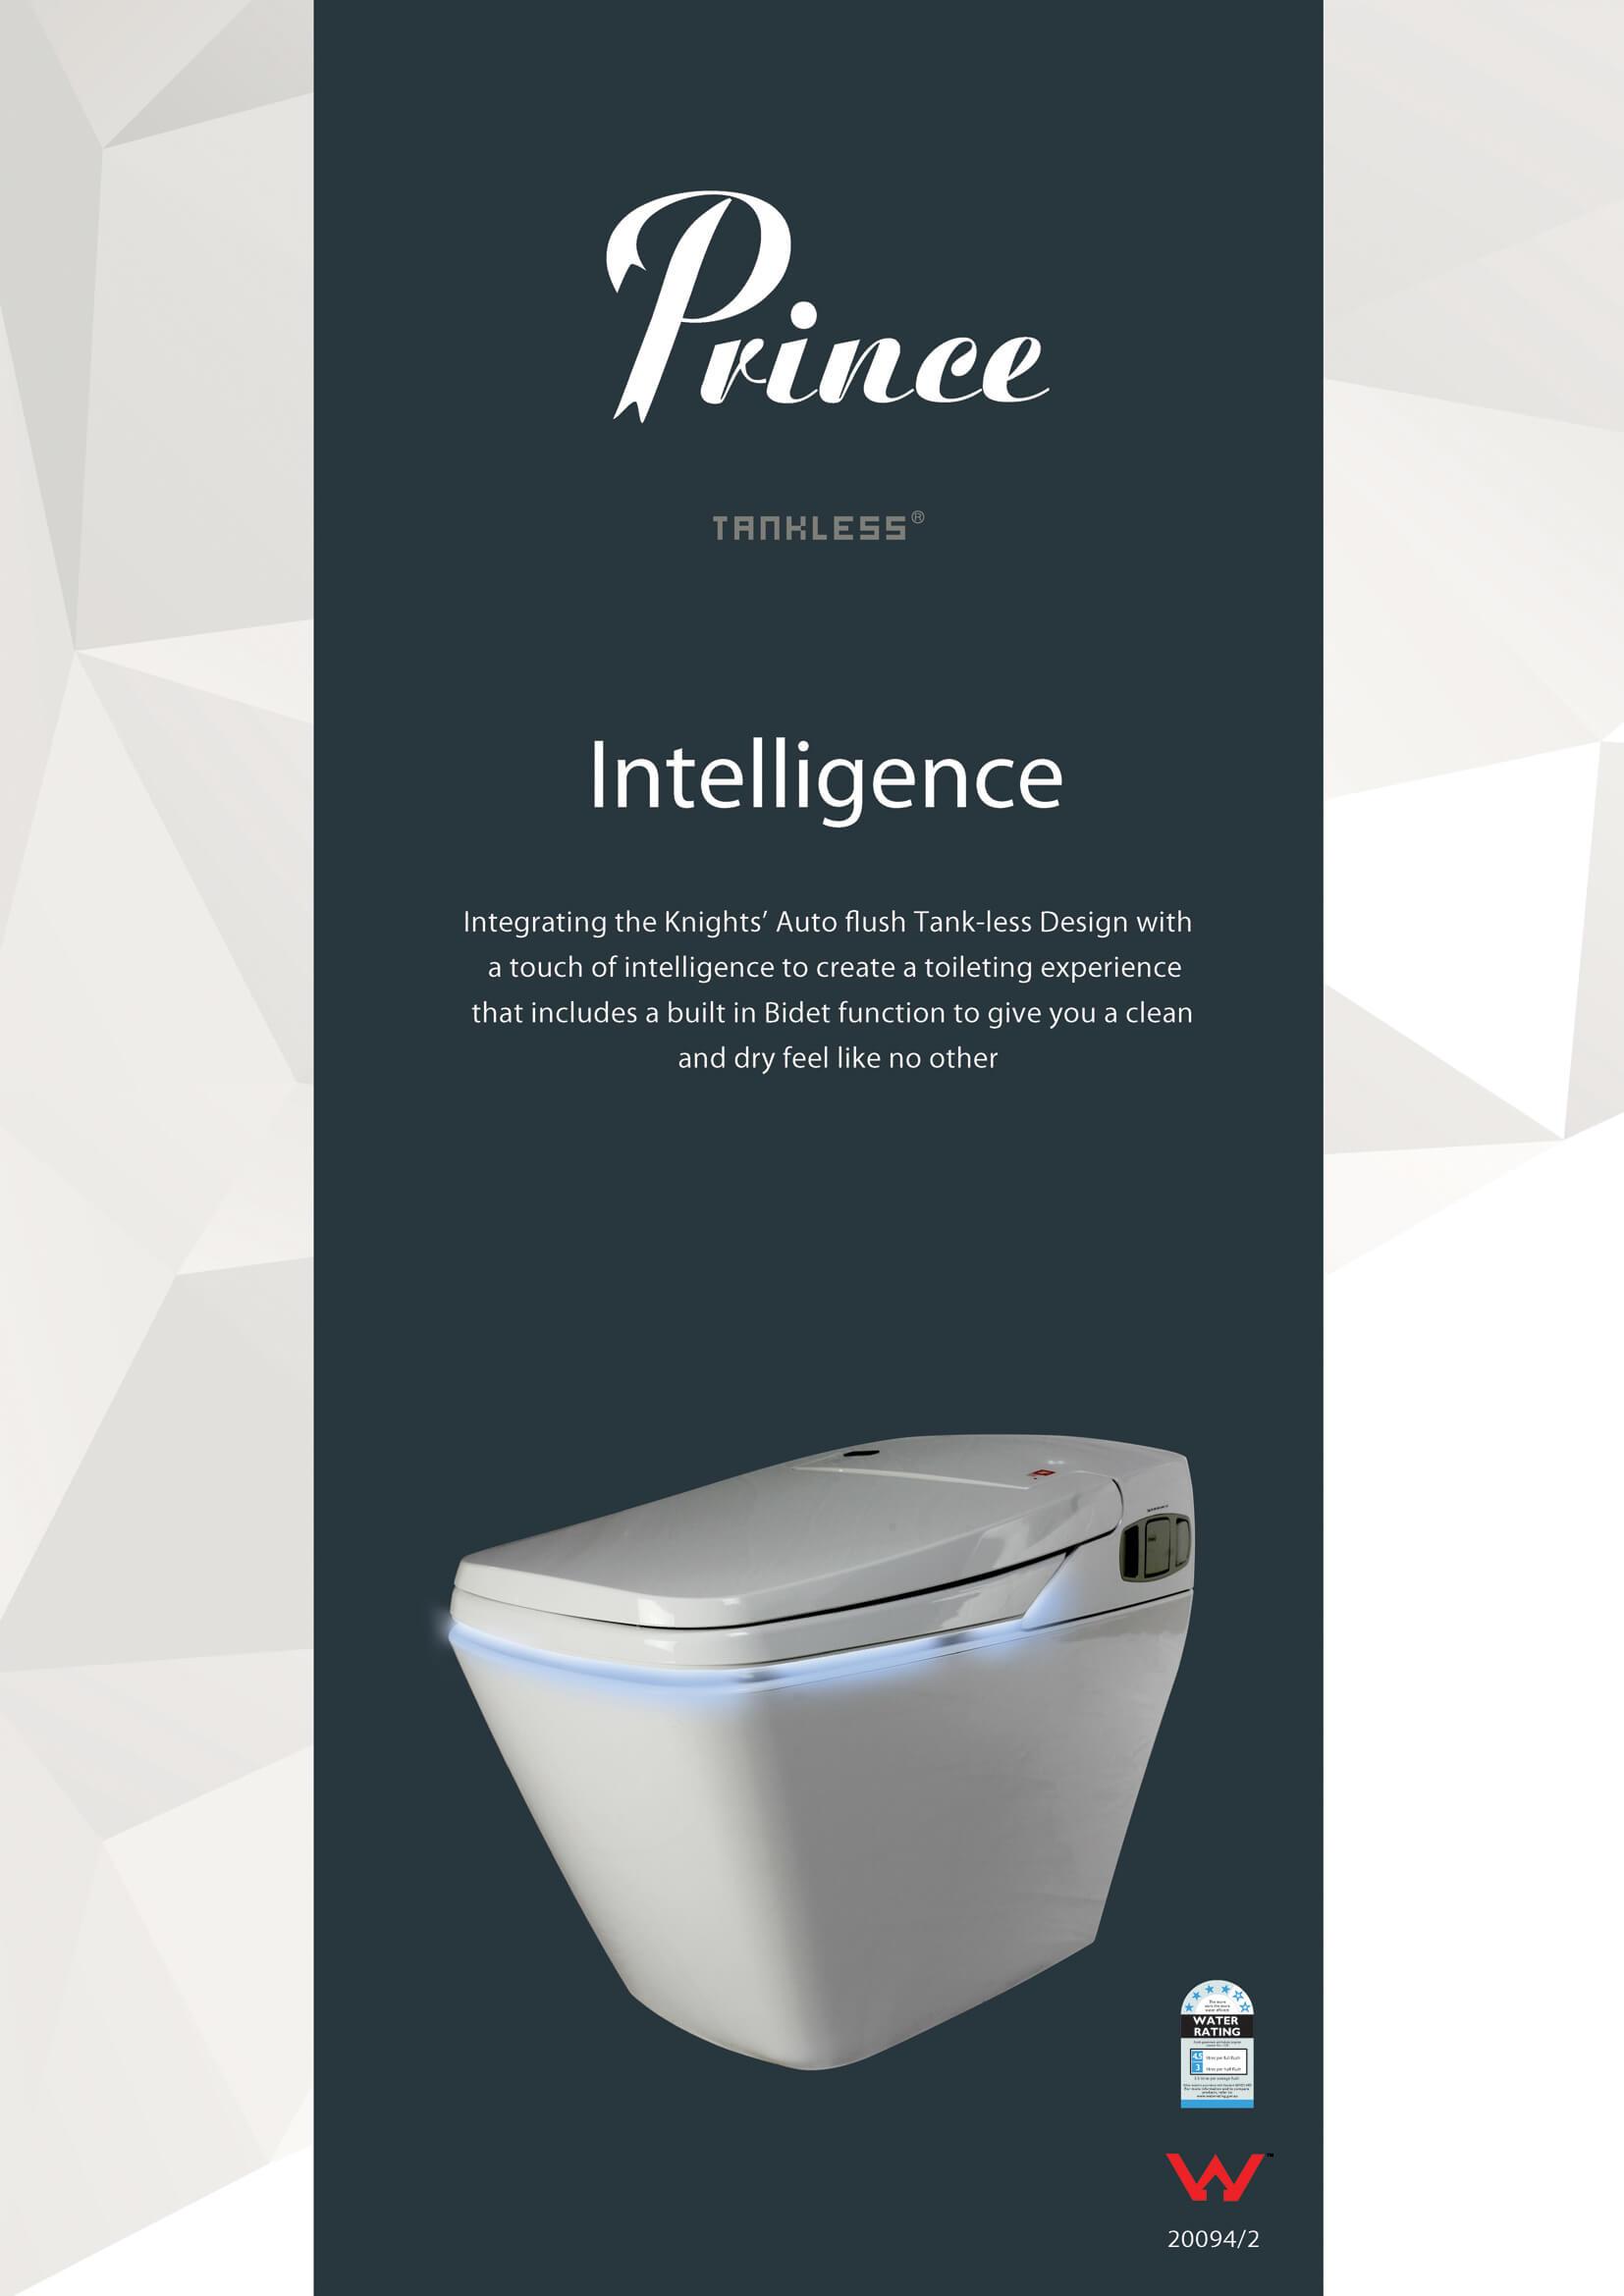 prince-brochure-throne-2016-page-2.jpg